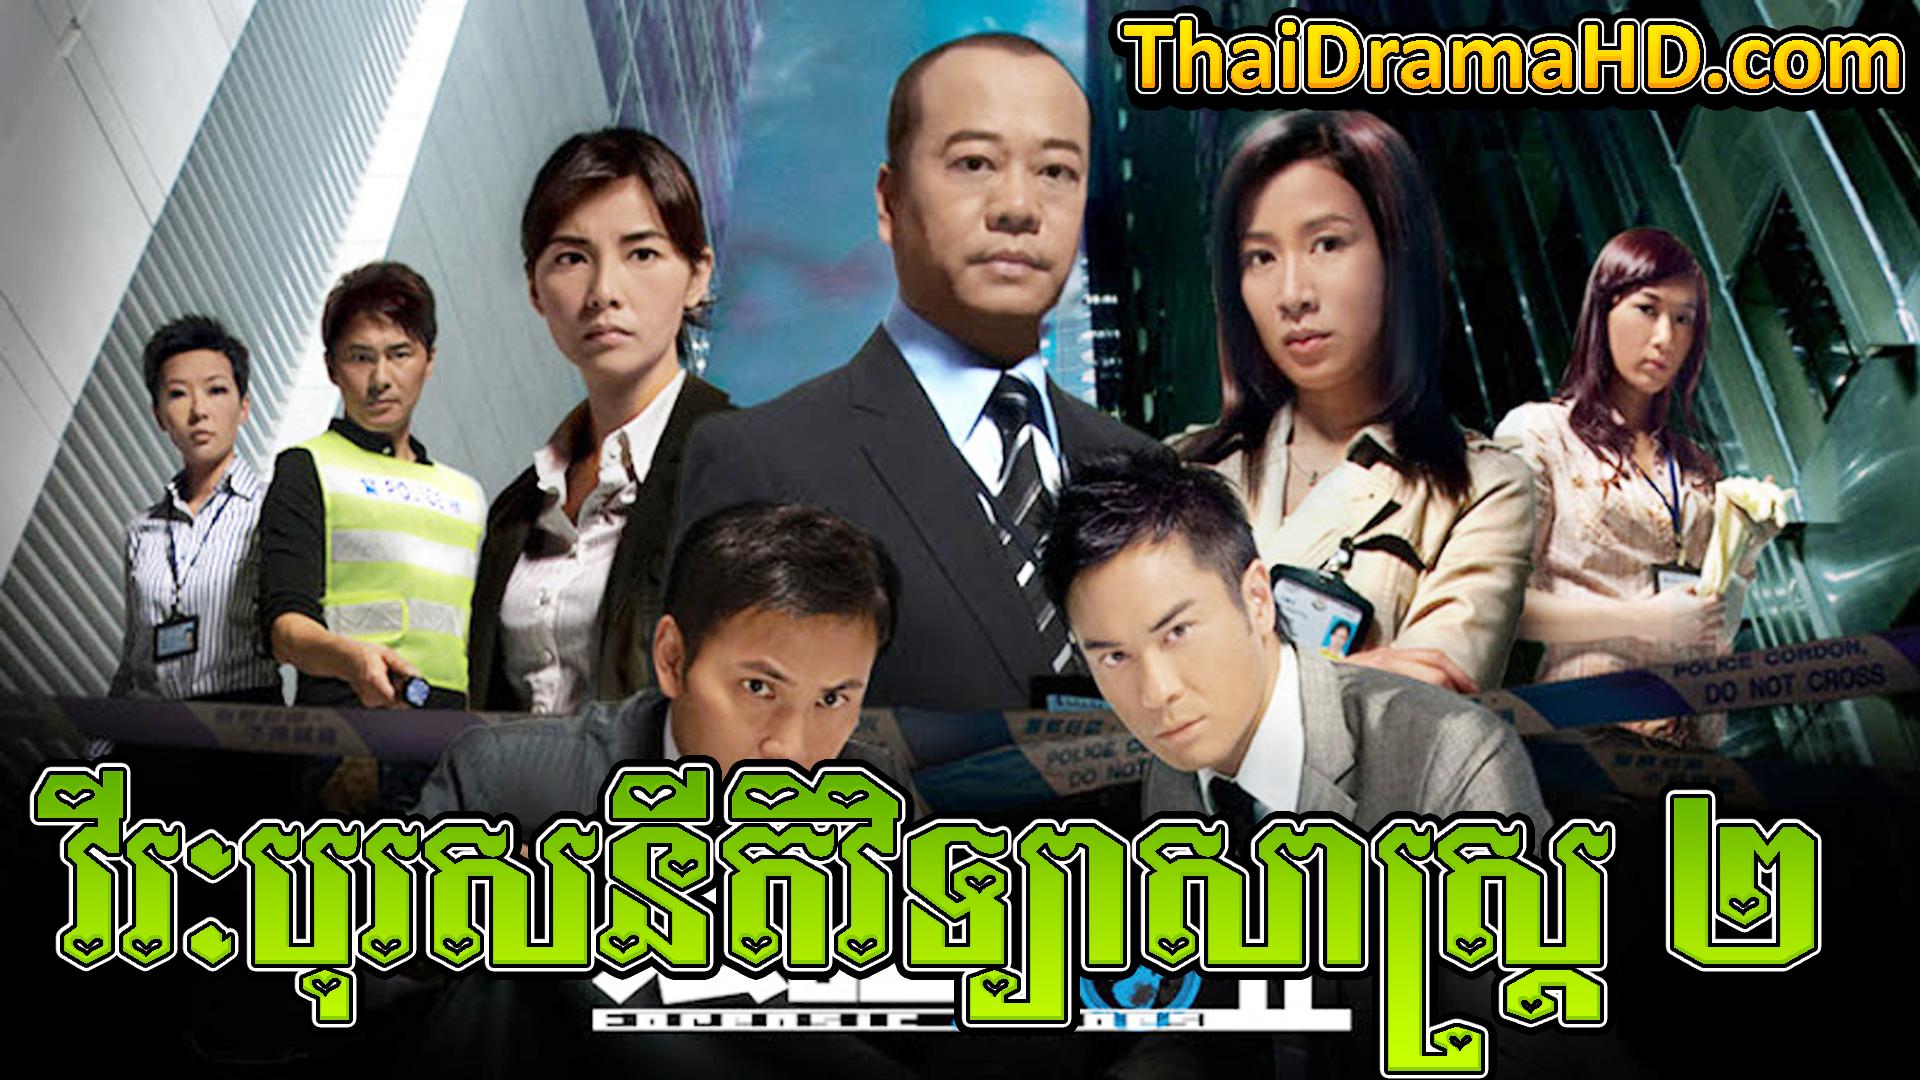 Virak Boros Nitek Vithyeasastra | Thai Drama | Thai Drama HD | Khmer Movie | Phumikhmer | Phumikhmer1 | movie-khmer | video4khmer | khmotions | kolabkhmer | khmer drama | ksdrama | cookingtips | roscheat | khmertimeskh | khmerkomsan | phumi7 | merlkon | film2us | movie2kh | sweetdrama | khmercitylove | khreplay | tvb cambodia drama | ckh7 | srokthai | phumimedia | phumi8 | khmer avenue | khmer search | Soyo | khmerfans